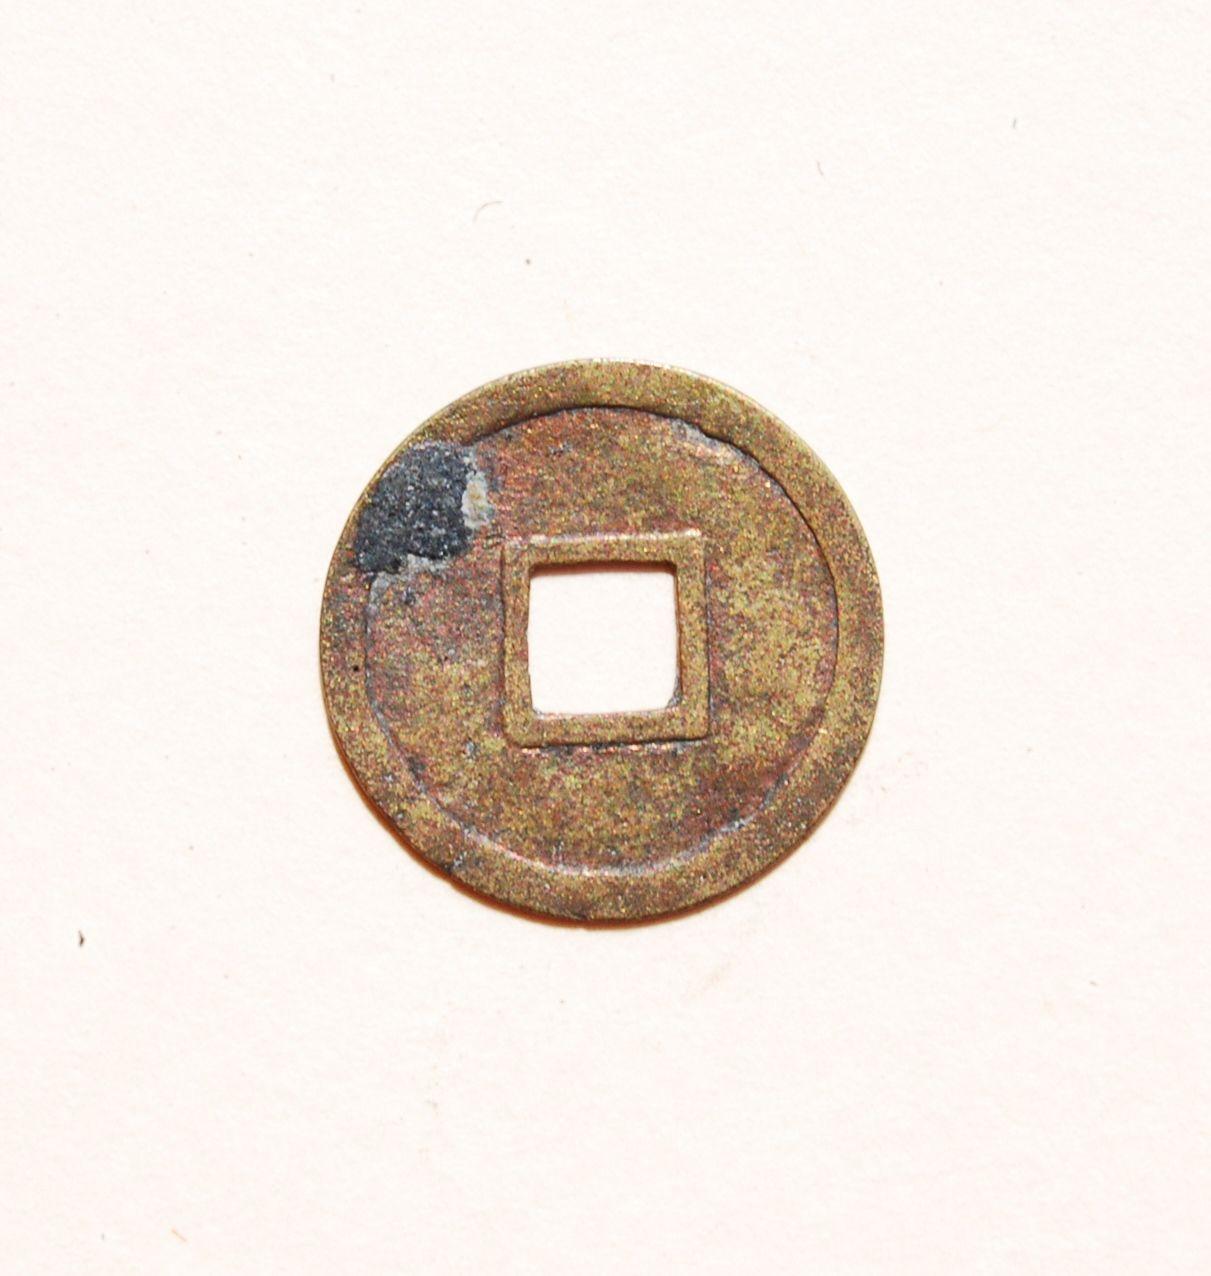 8b. Reverse side of a Ming Ming Tong Bao (明命通寶) 1 cash coin, cast in 1820 during the Ruansheng Mingming reign.